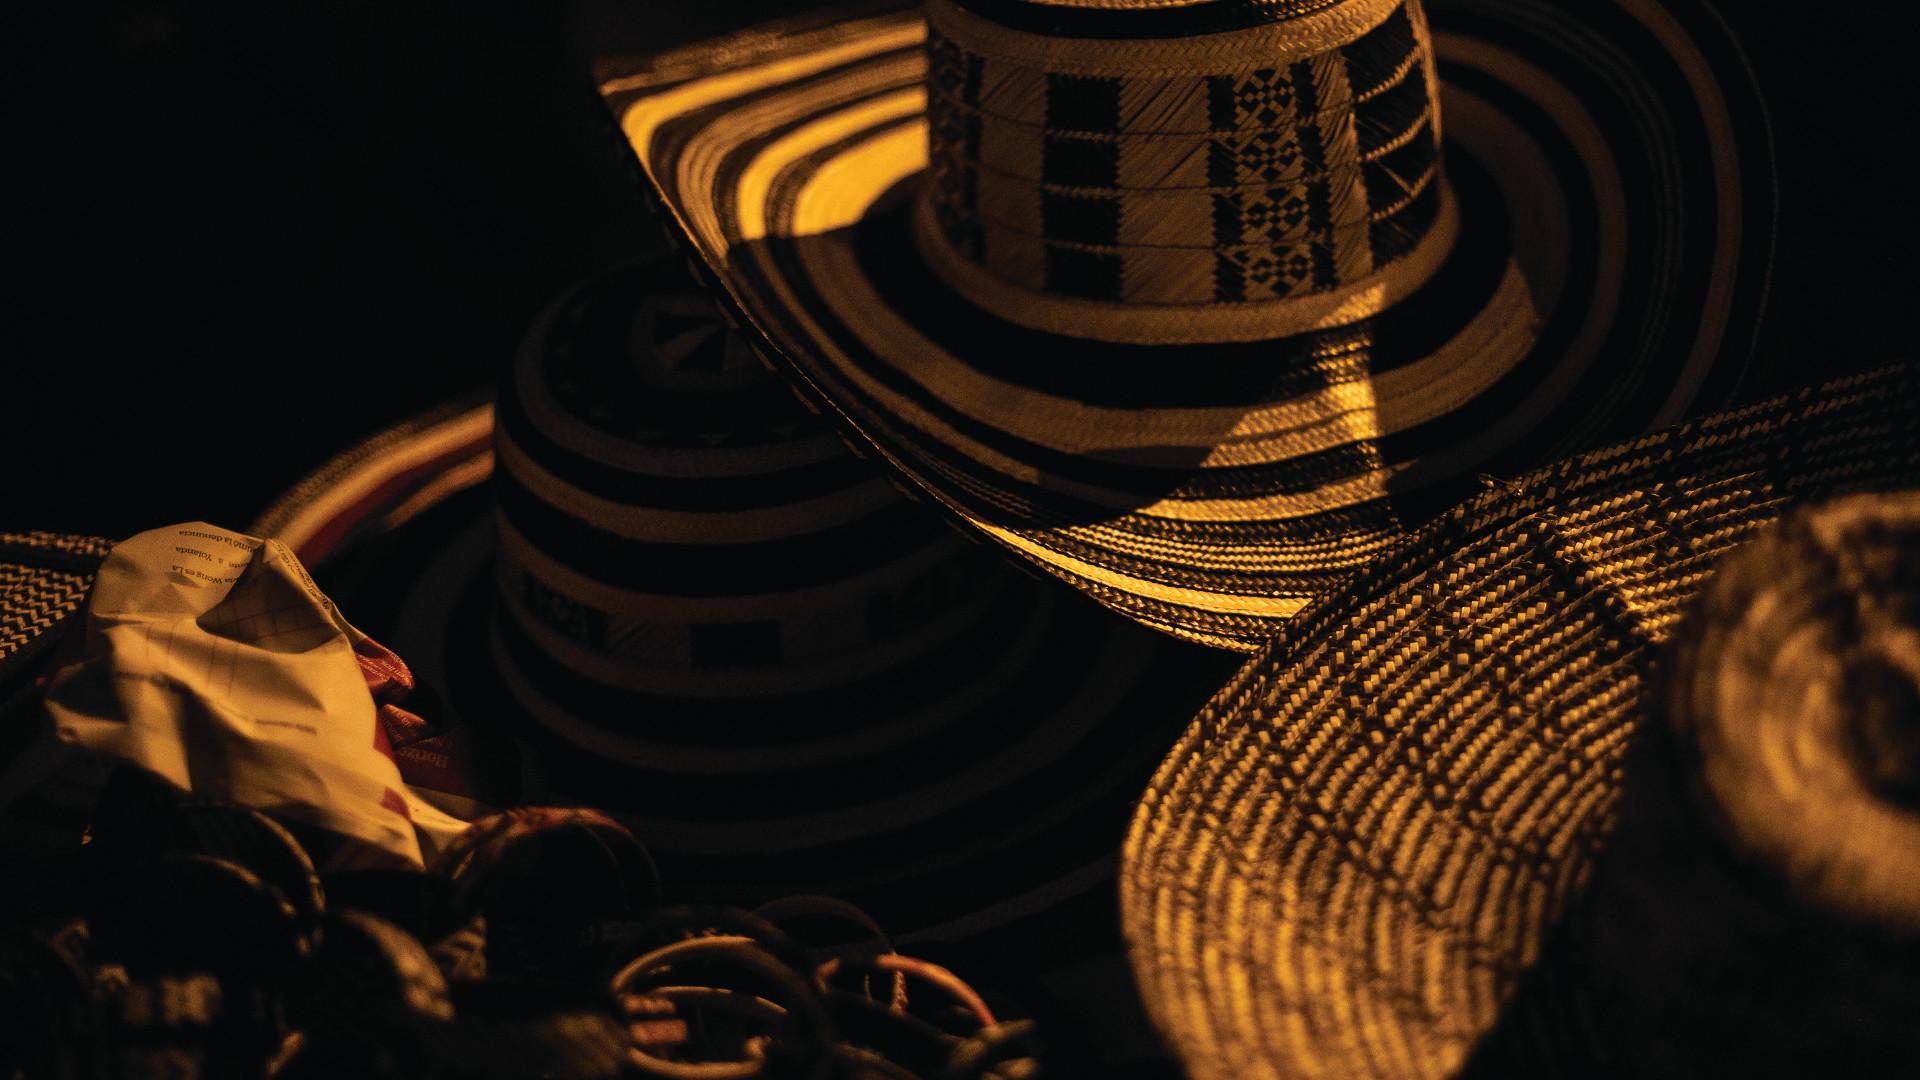 jeronimo-martins-sombrero-vueltiao-banner